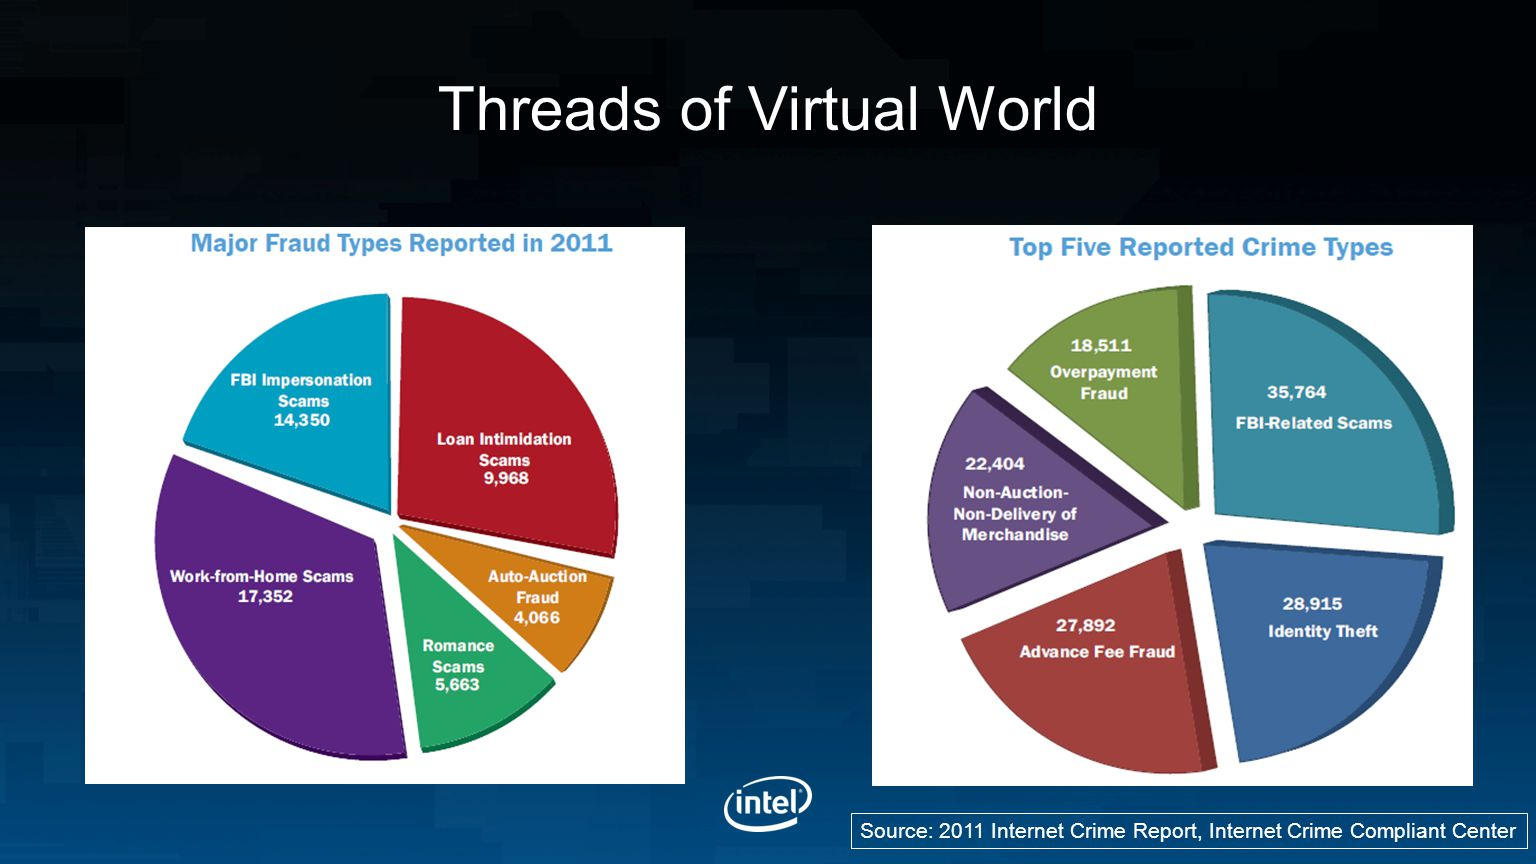 Threads of Virtual World